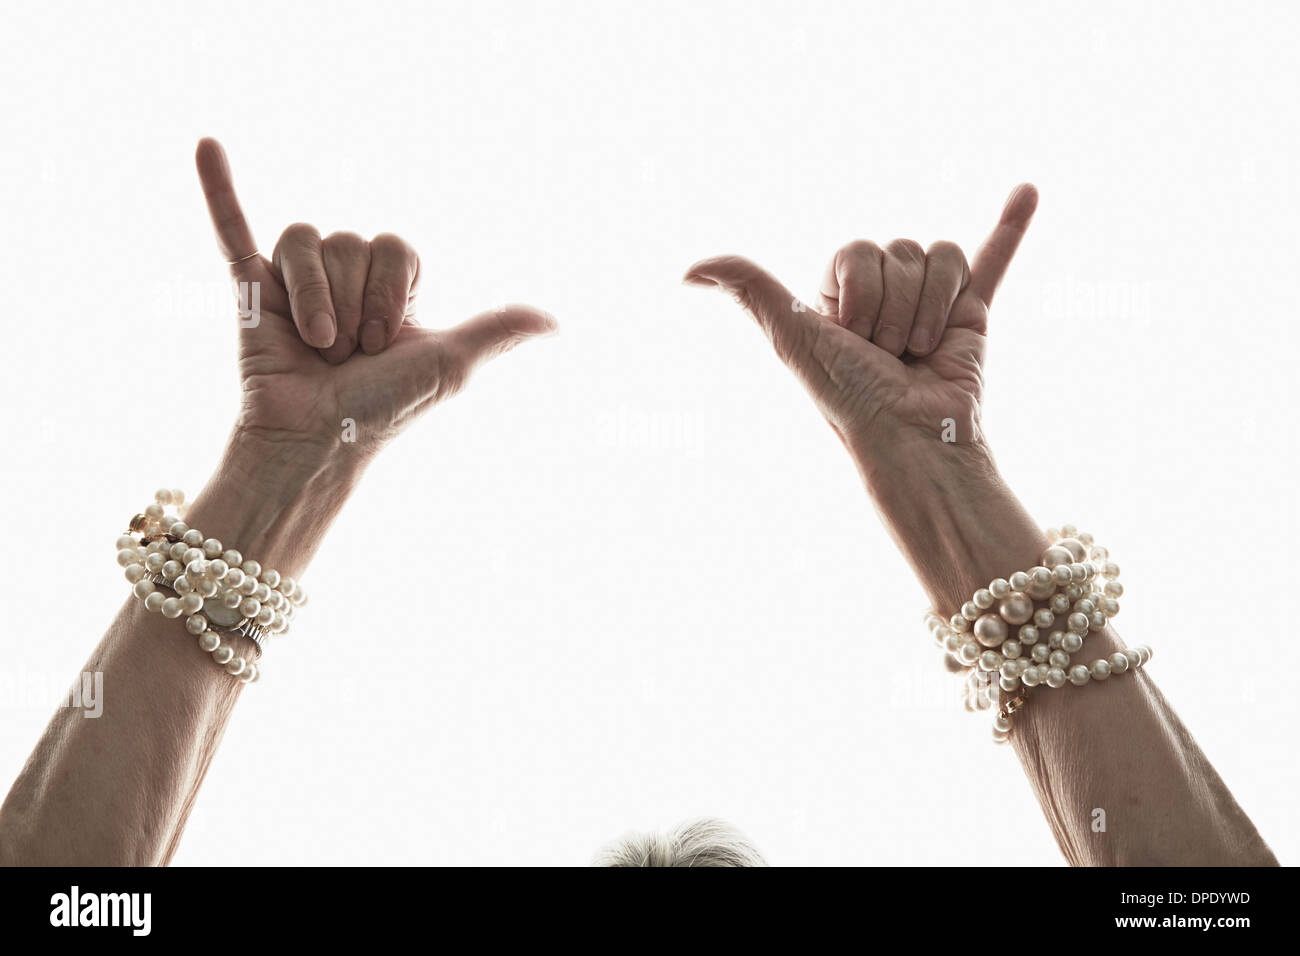 Studio shot of mature woman's gesturing hands - Stock Image